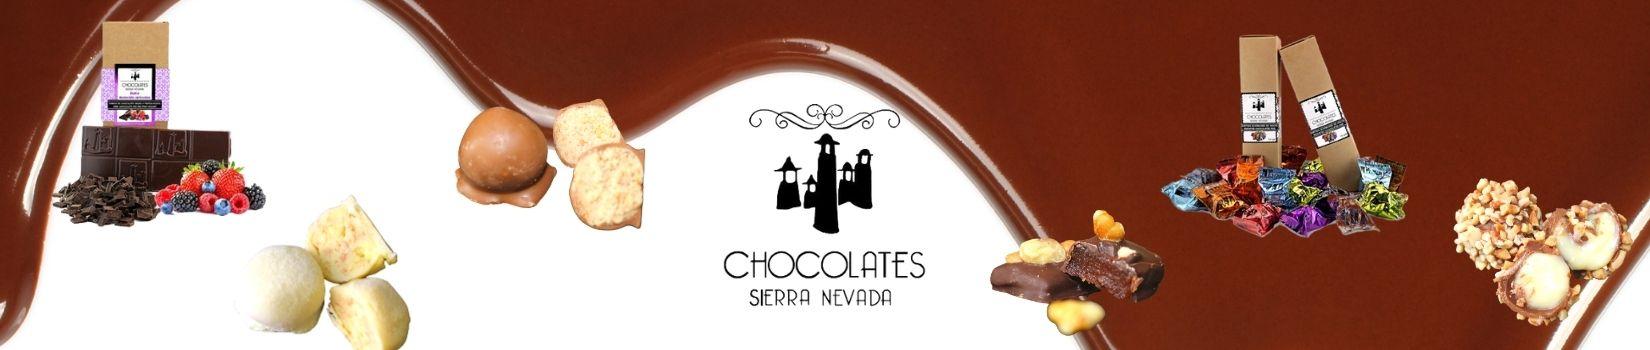 Chocolate Sierra Nevada